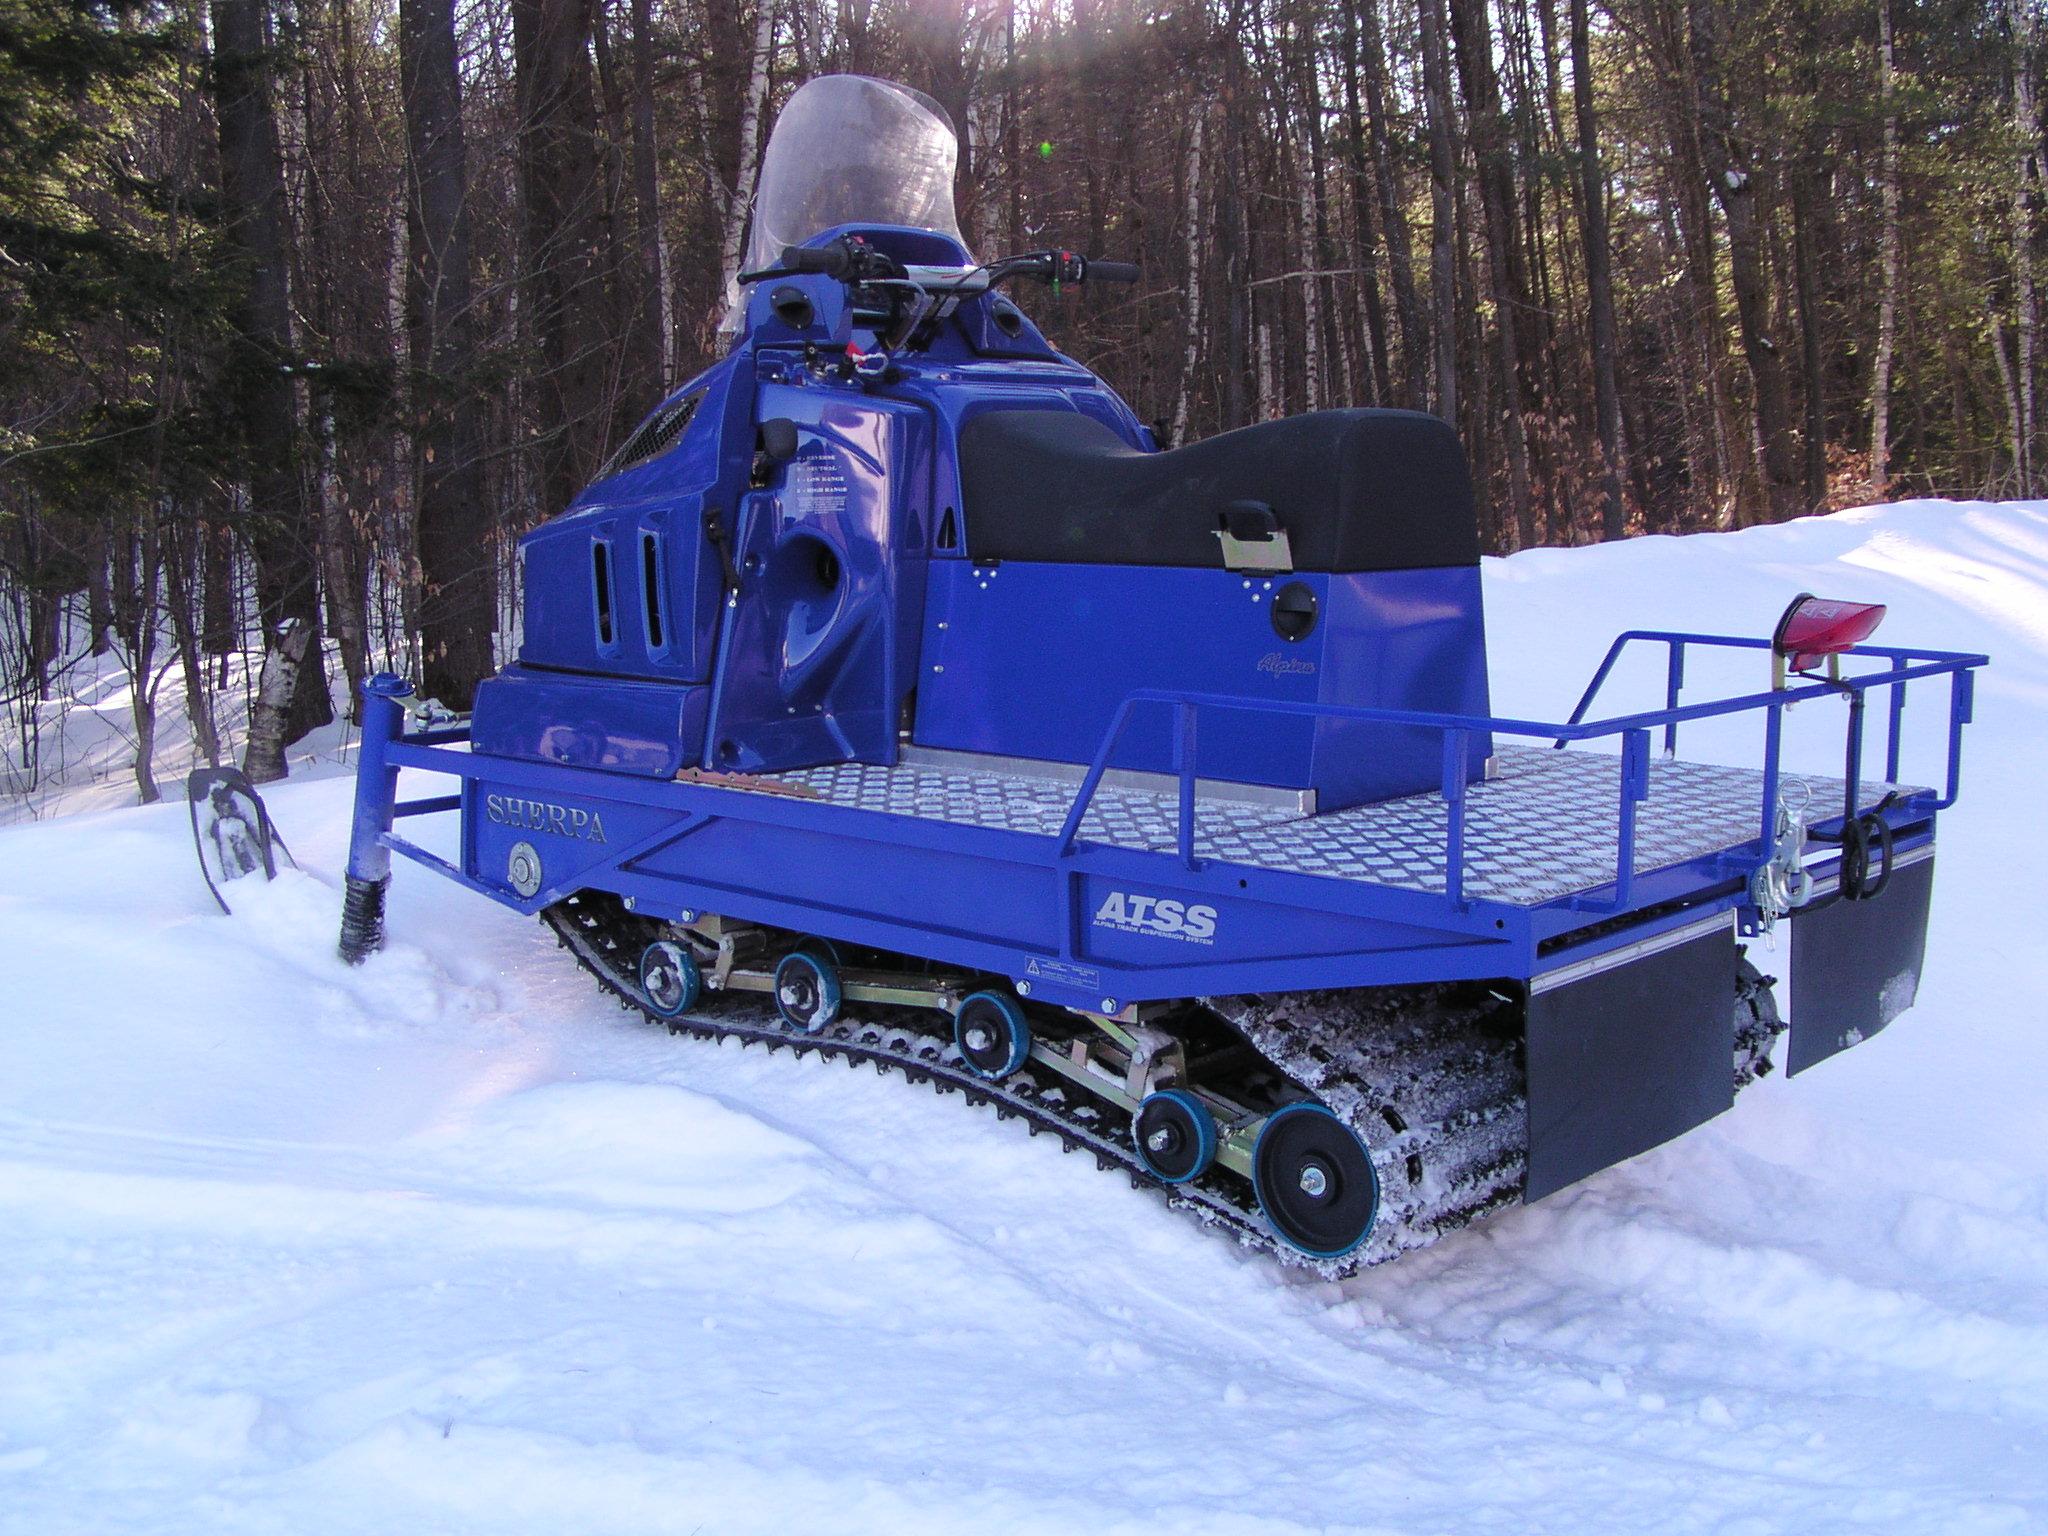 Alpina Sherpa, a dual track snowmobile